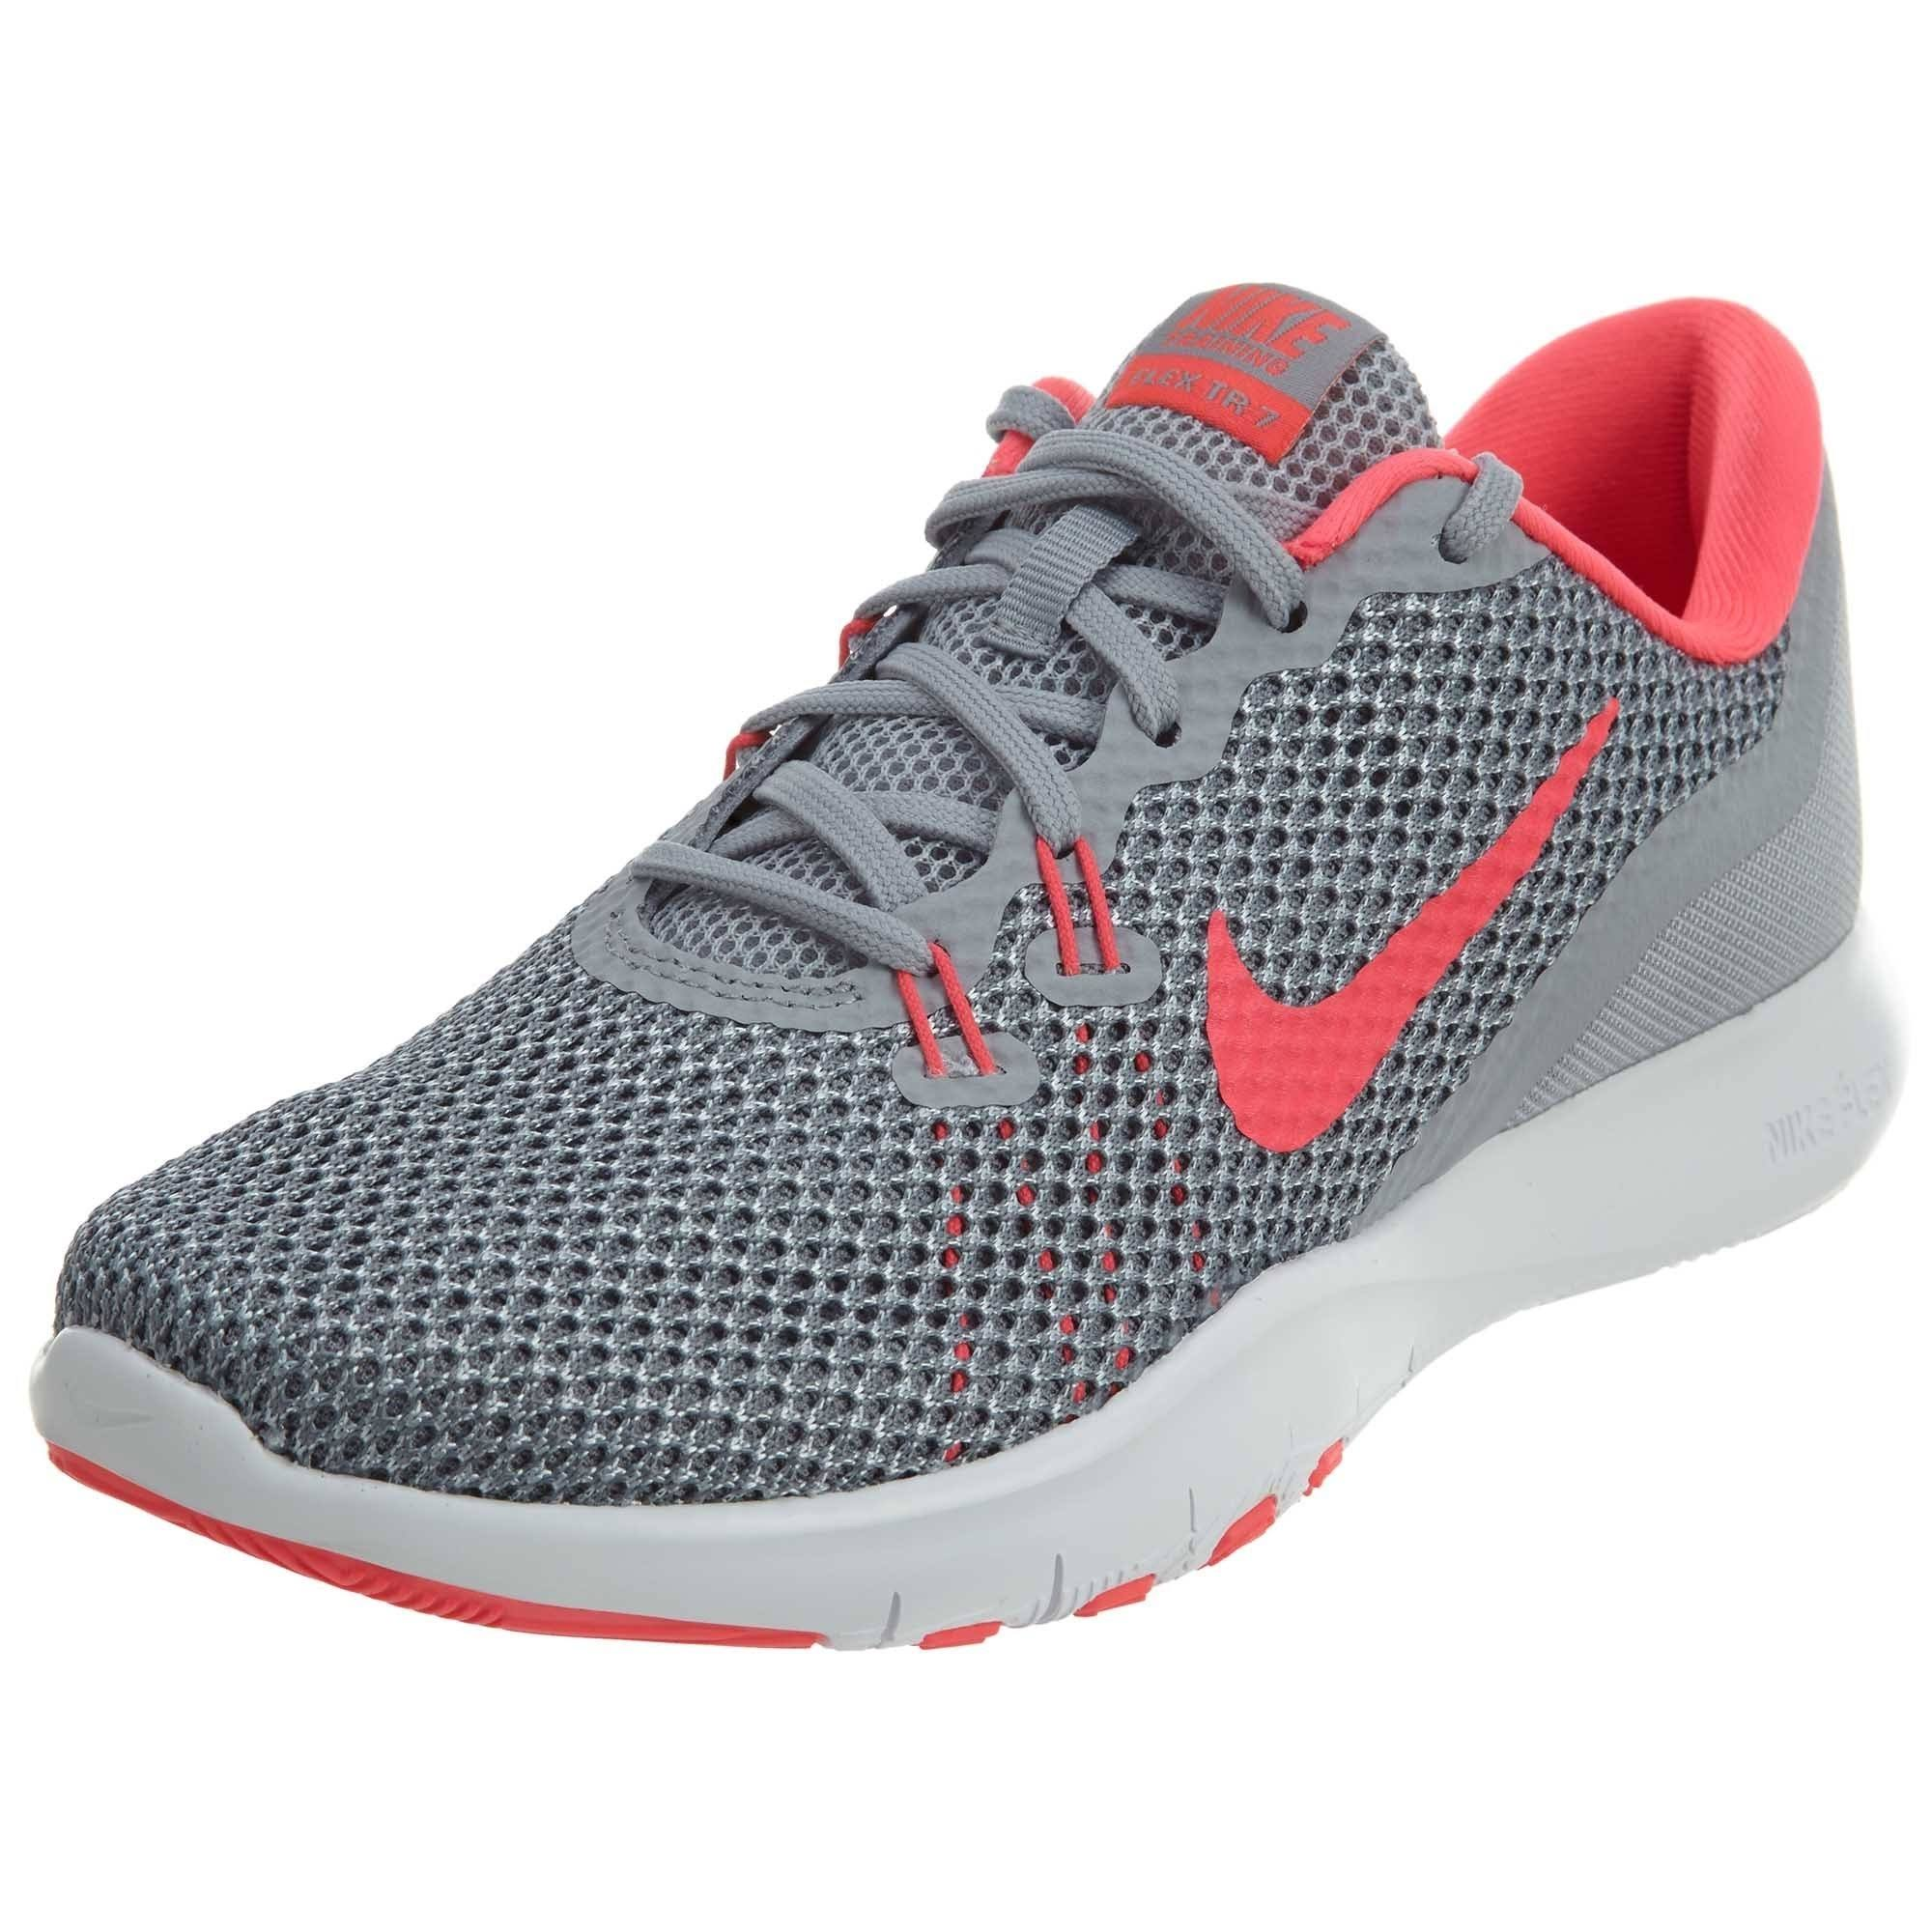 Trainer Flex 7 Women's Wolf Nike TrainingsschoenGrijs Grijsracer Stealth Pink N8vmn0Ow